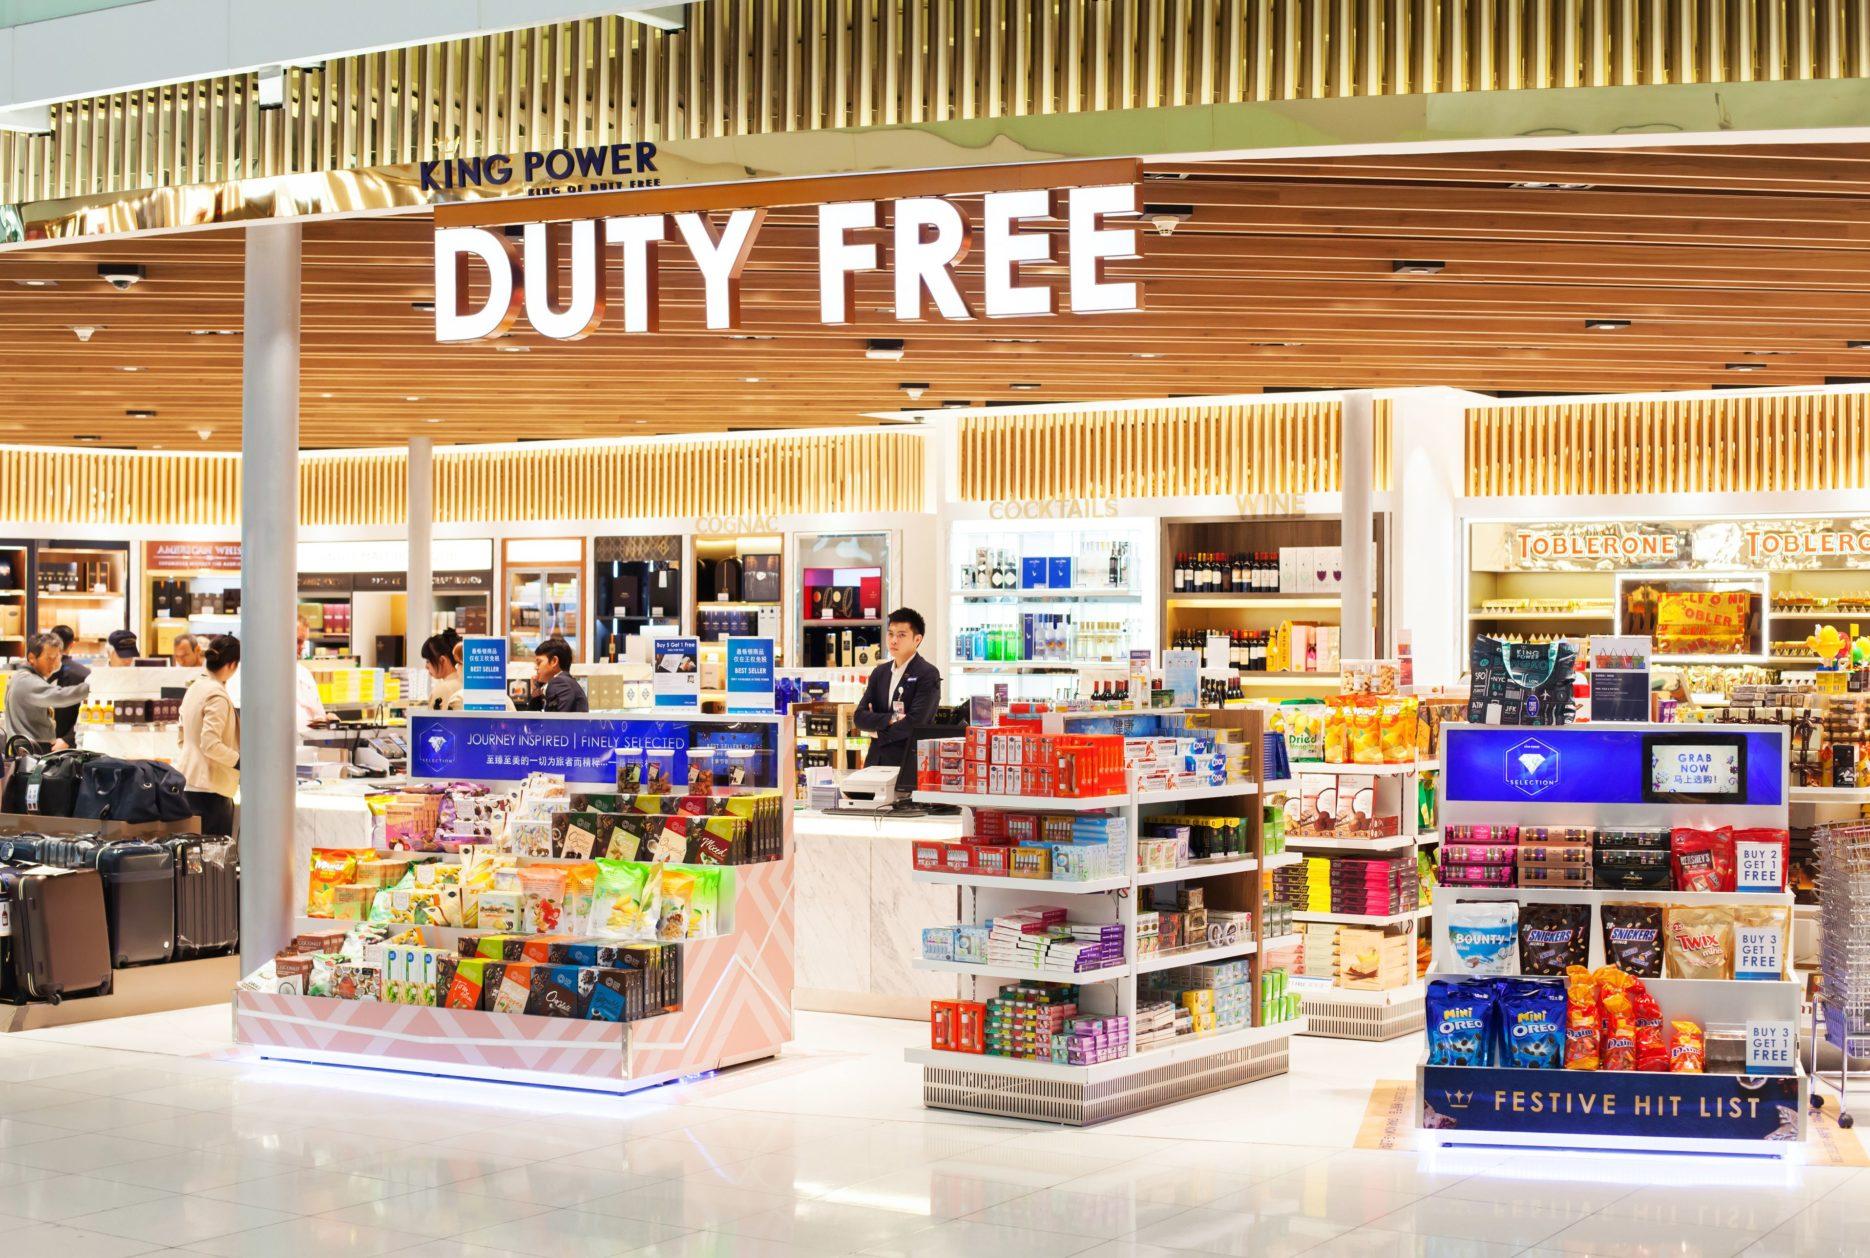 Duty-free shop